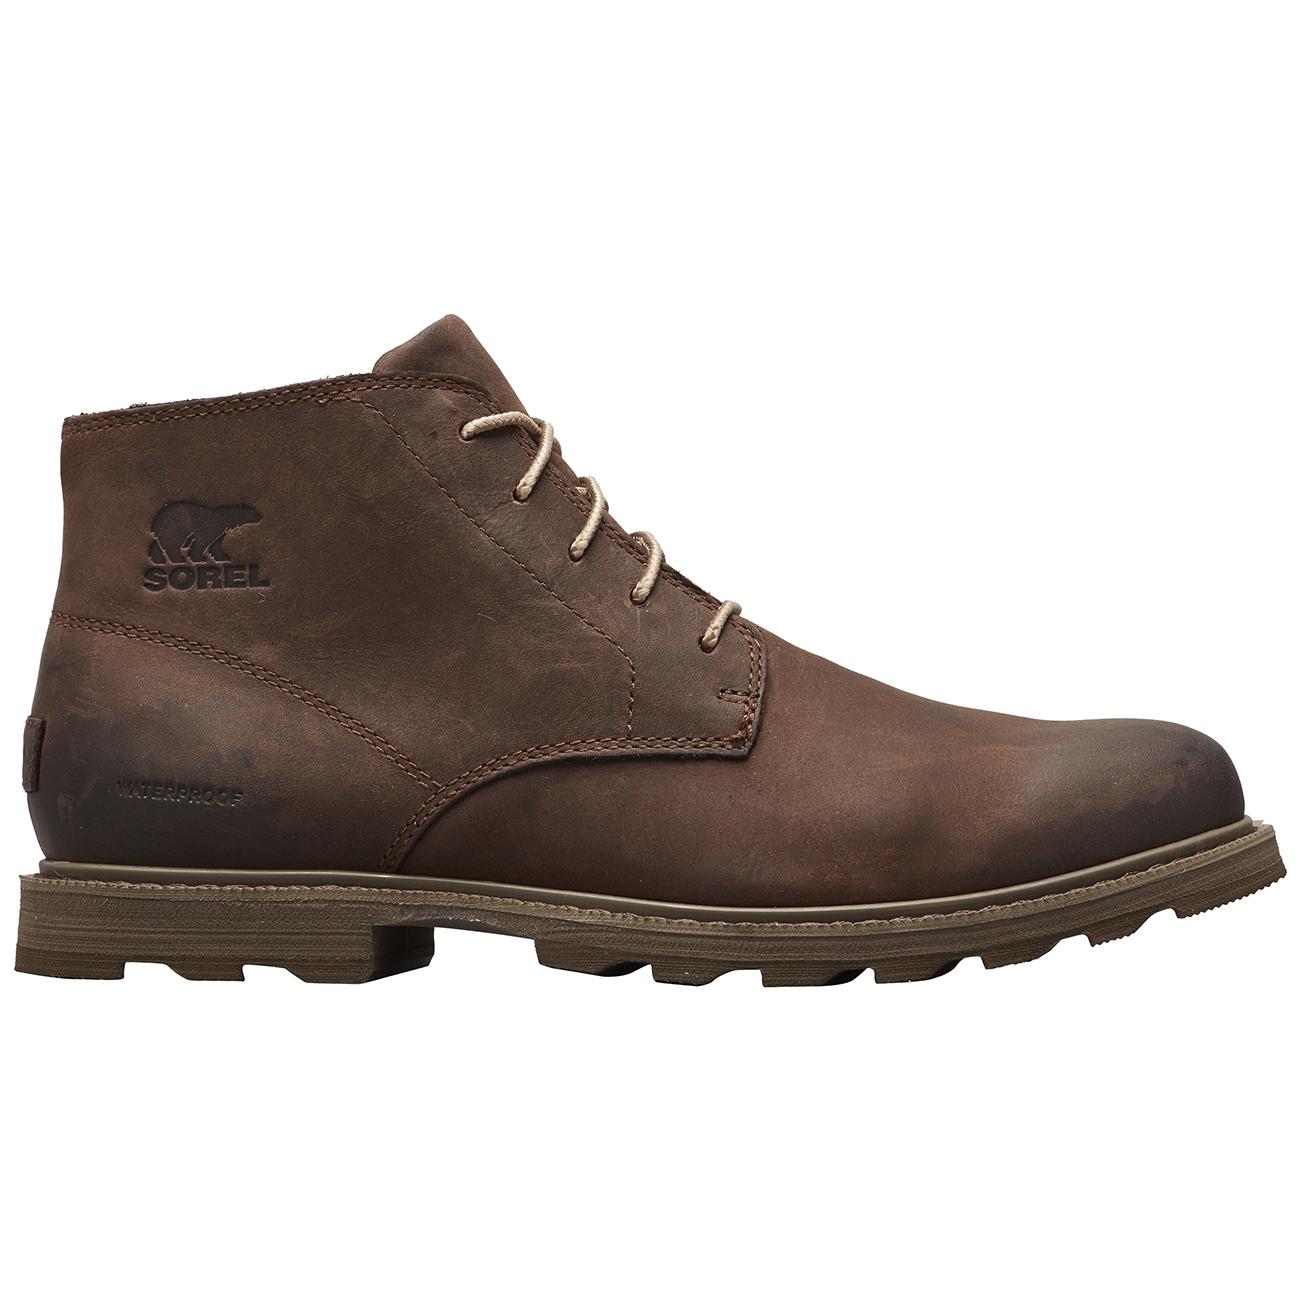 sorel ankle boots mens